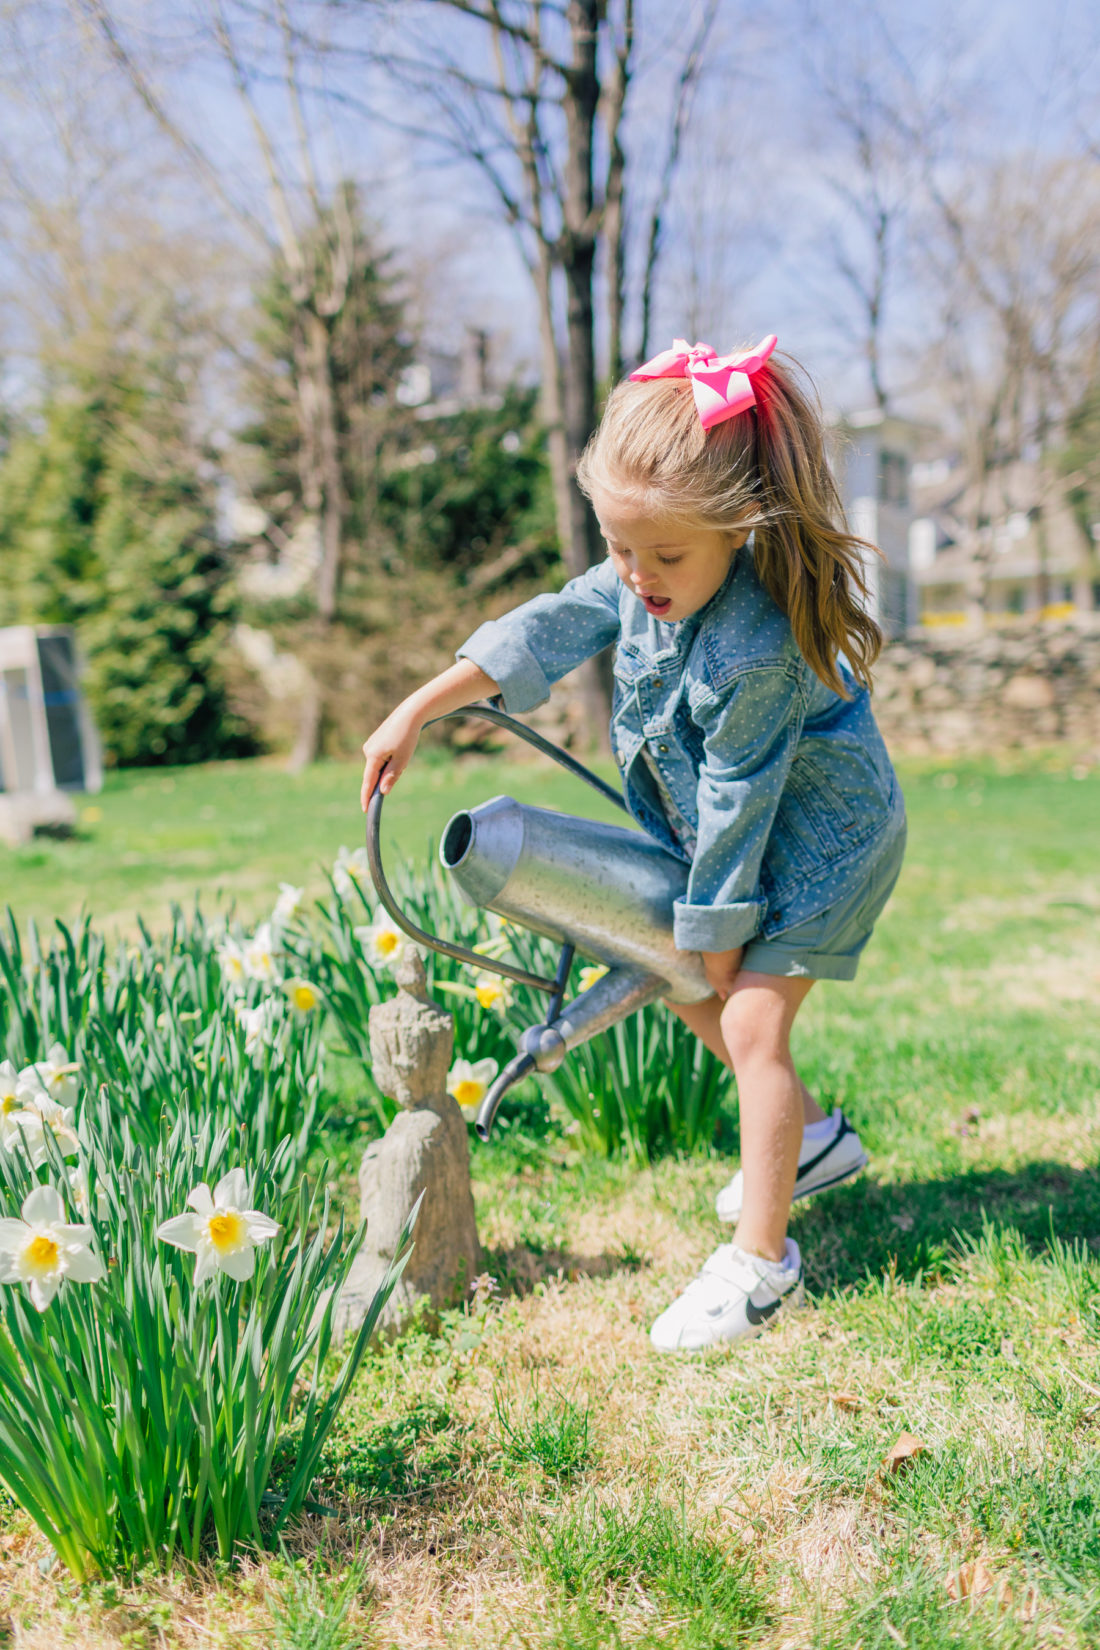 Eva Amurri Martino's daughter Marlowe waters the garden in her spring style picks